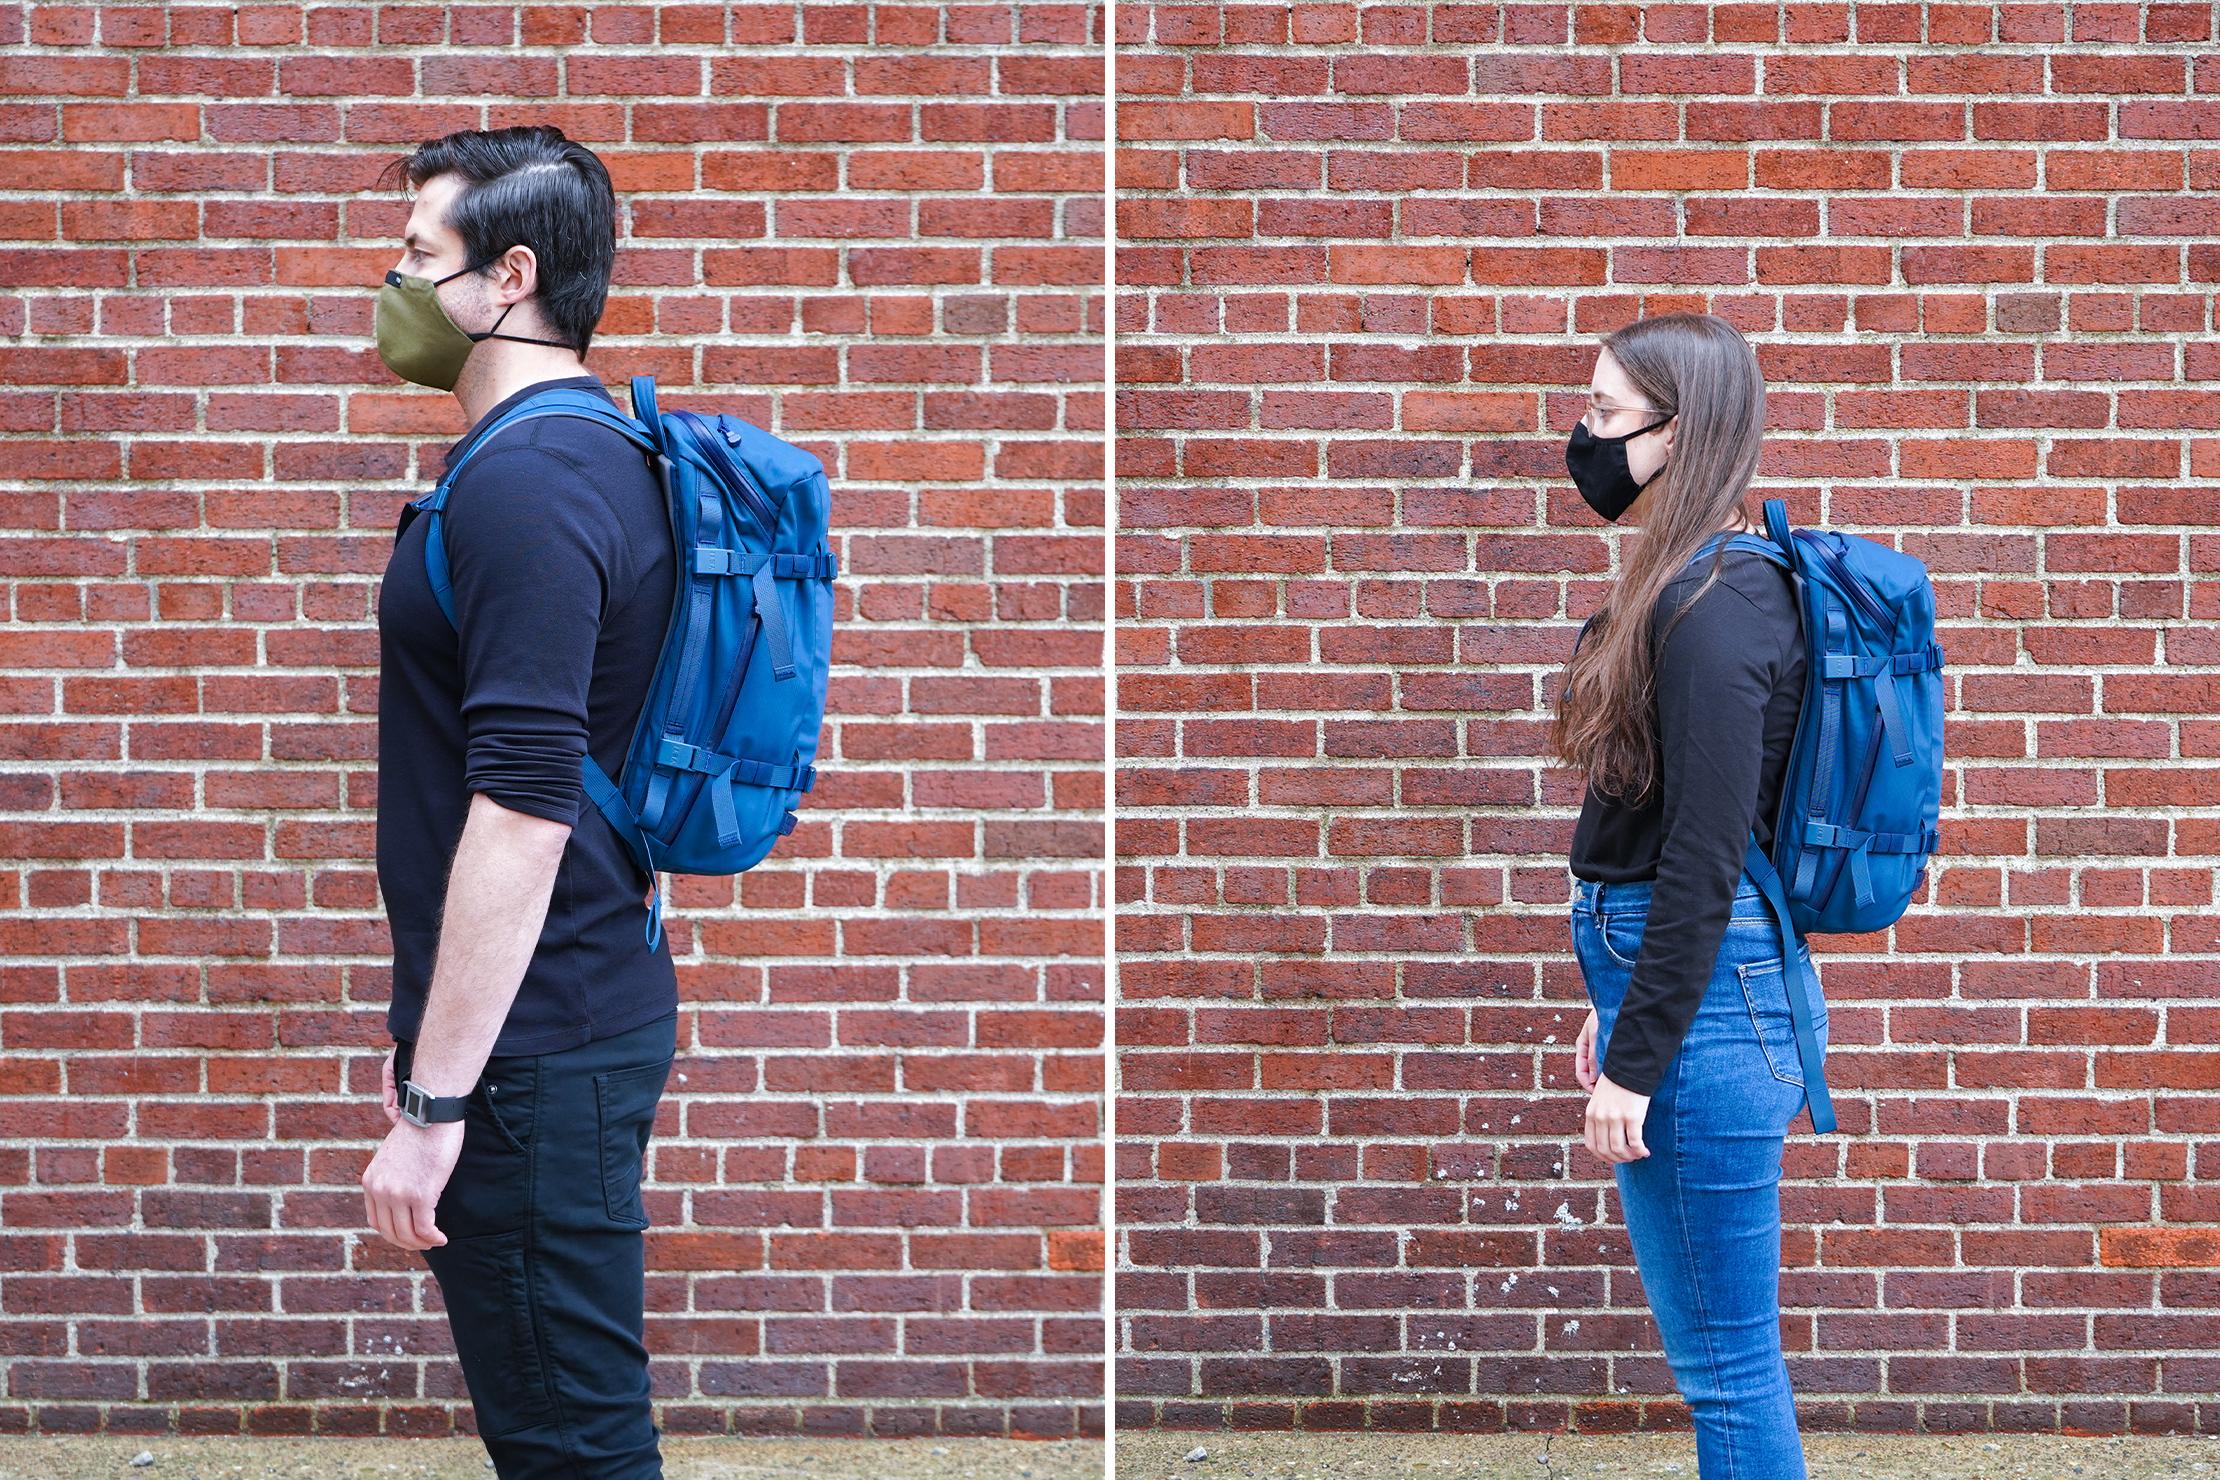 YETI Crossroads 22L Backpack | Male & Female Fit Photos